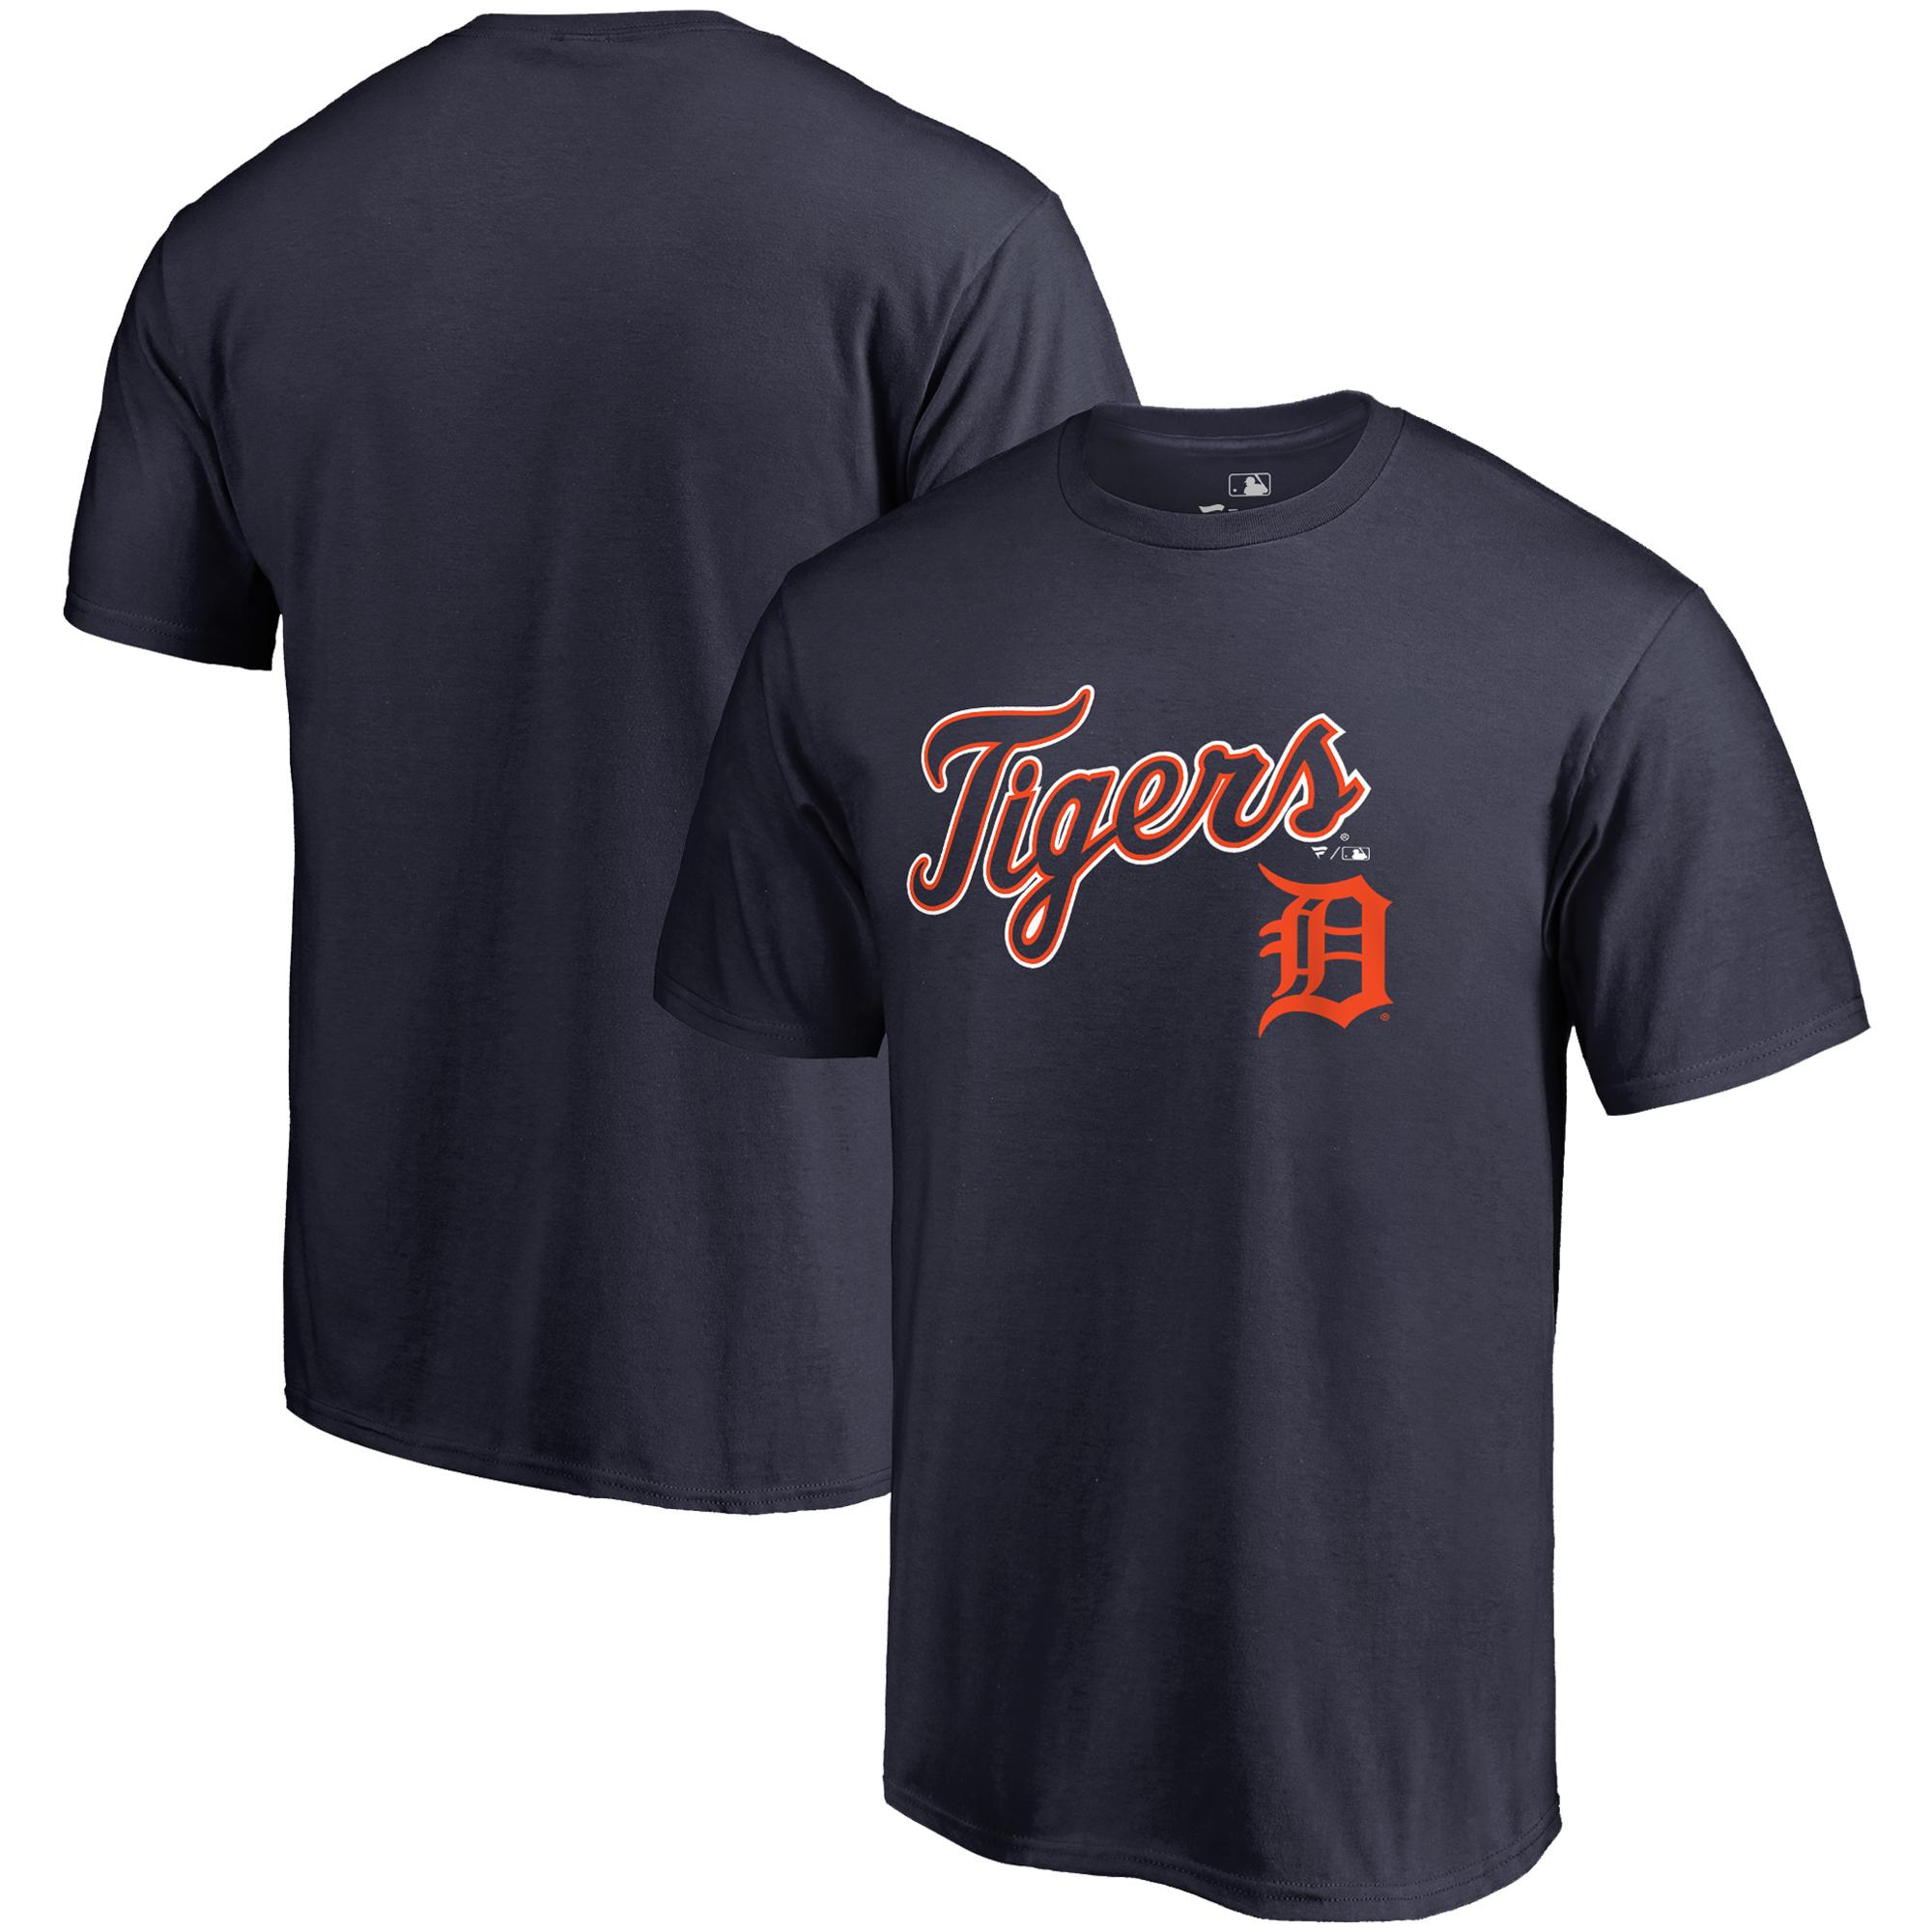 Detroit Tigers Fanatics Branded Team Lockup T-Shirt - Navy